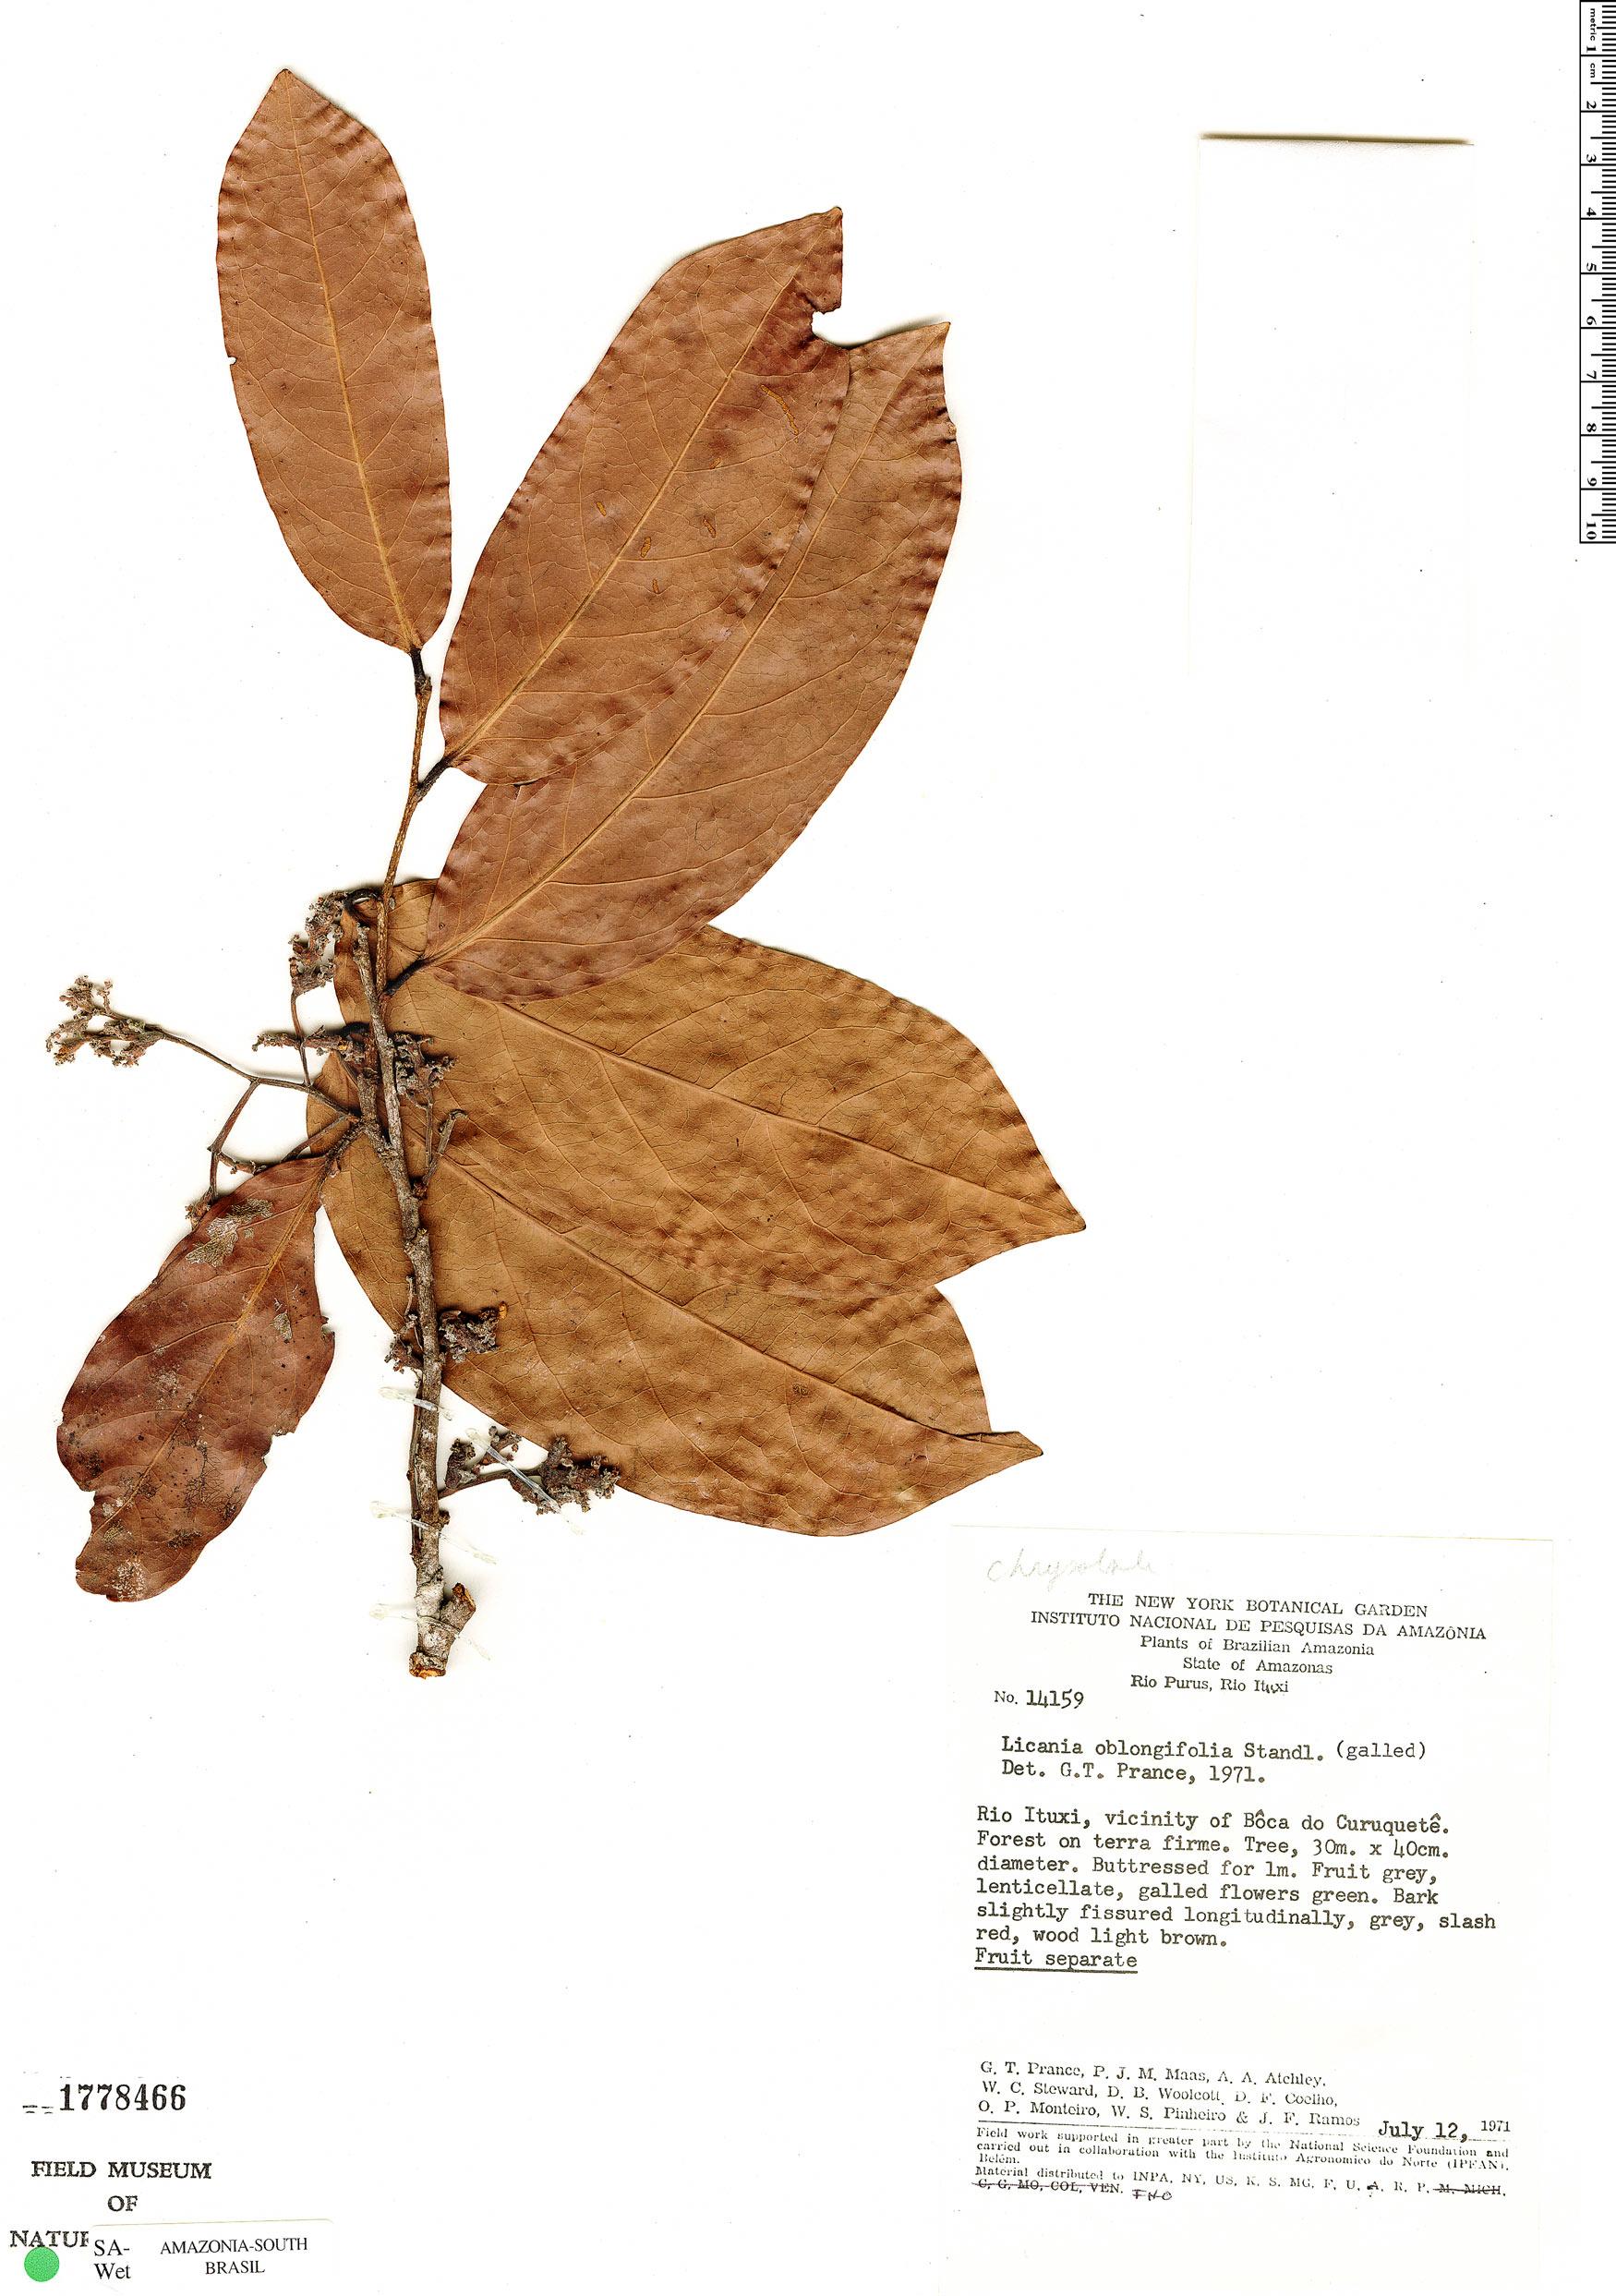 Espécime: Licania oblongifolia